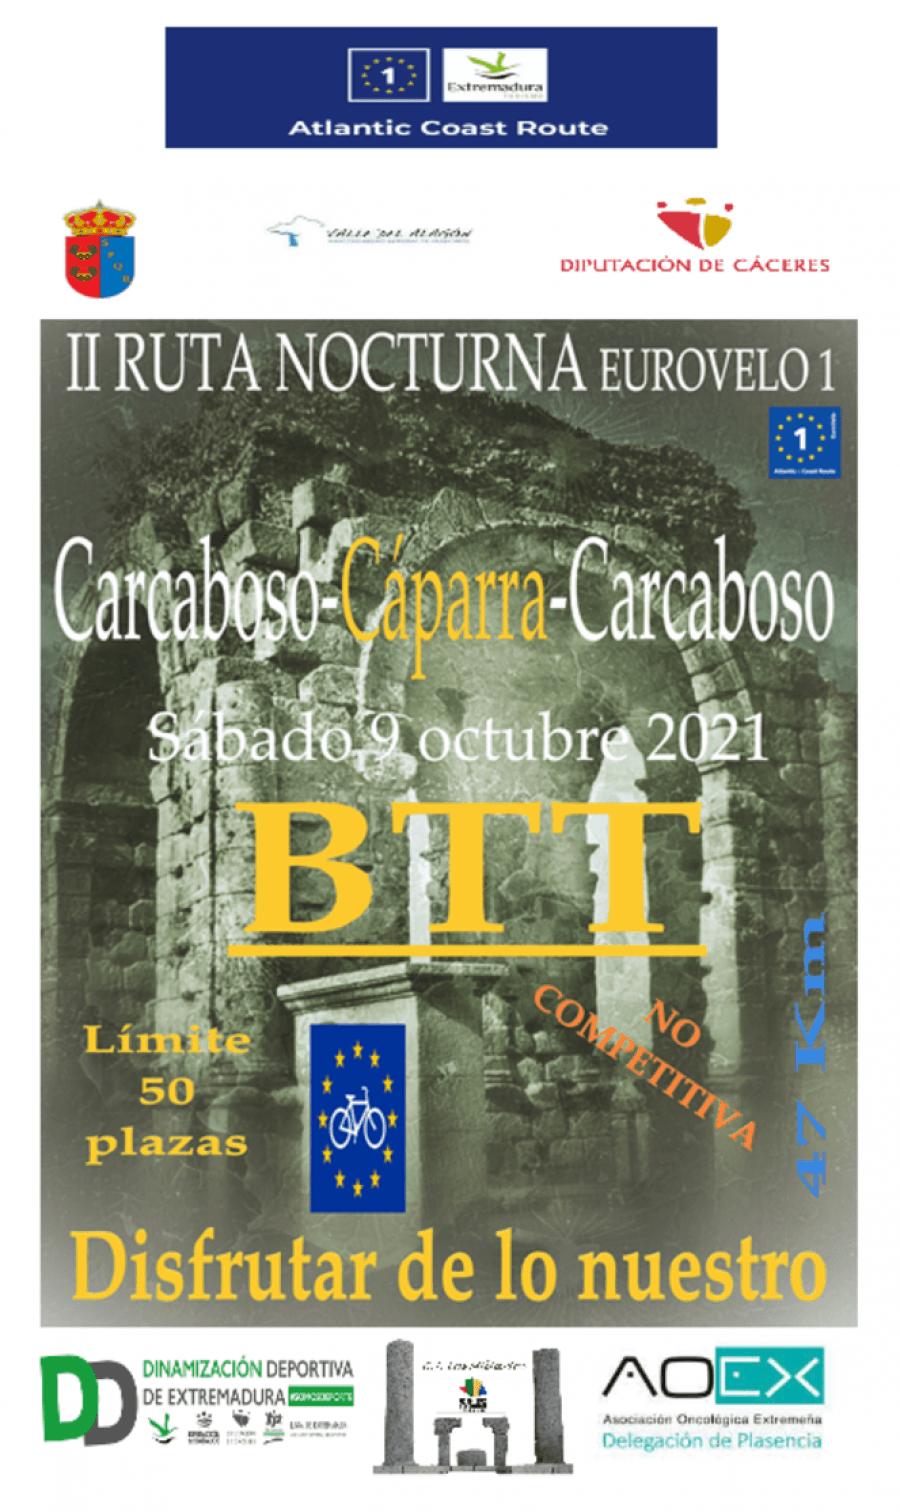 II RUTA NOCTURNA BTT EUROVELO 1